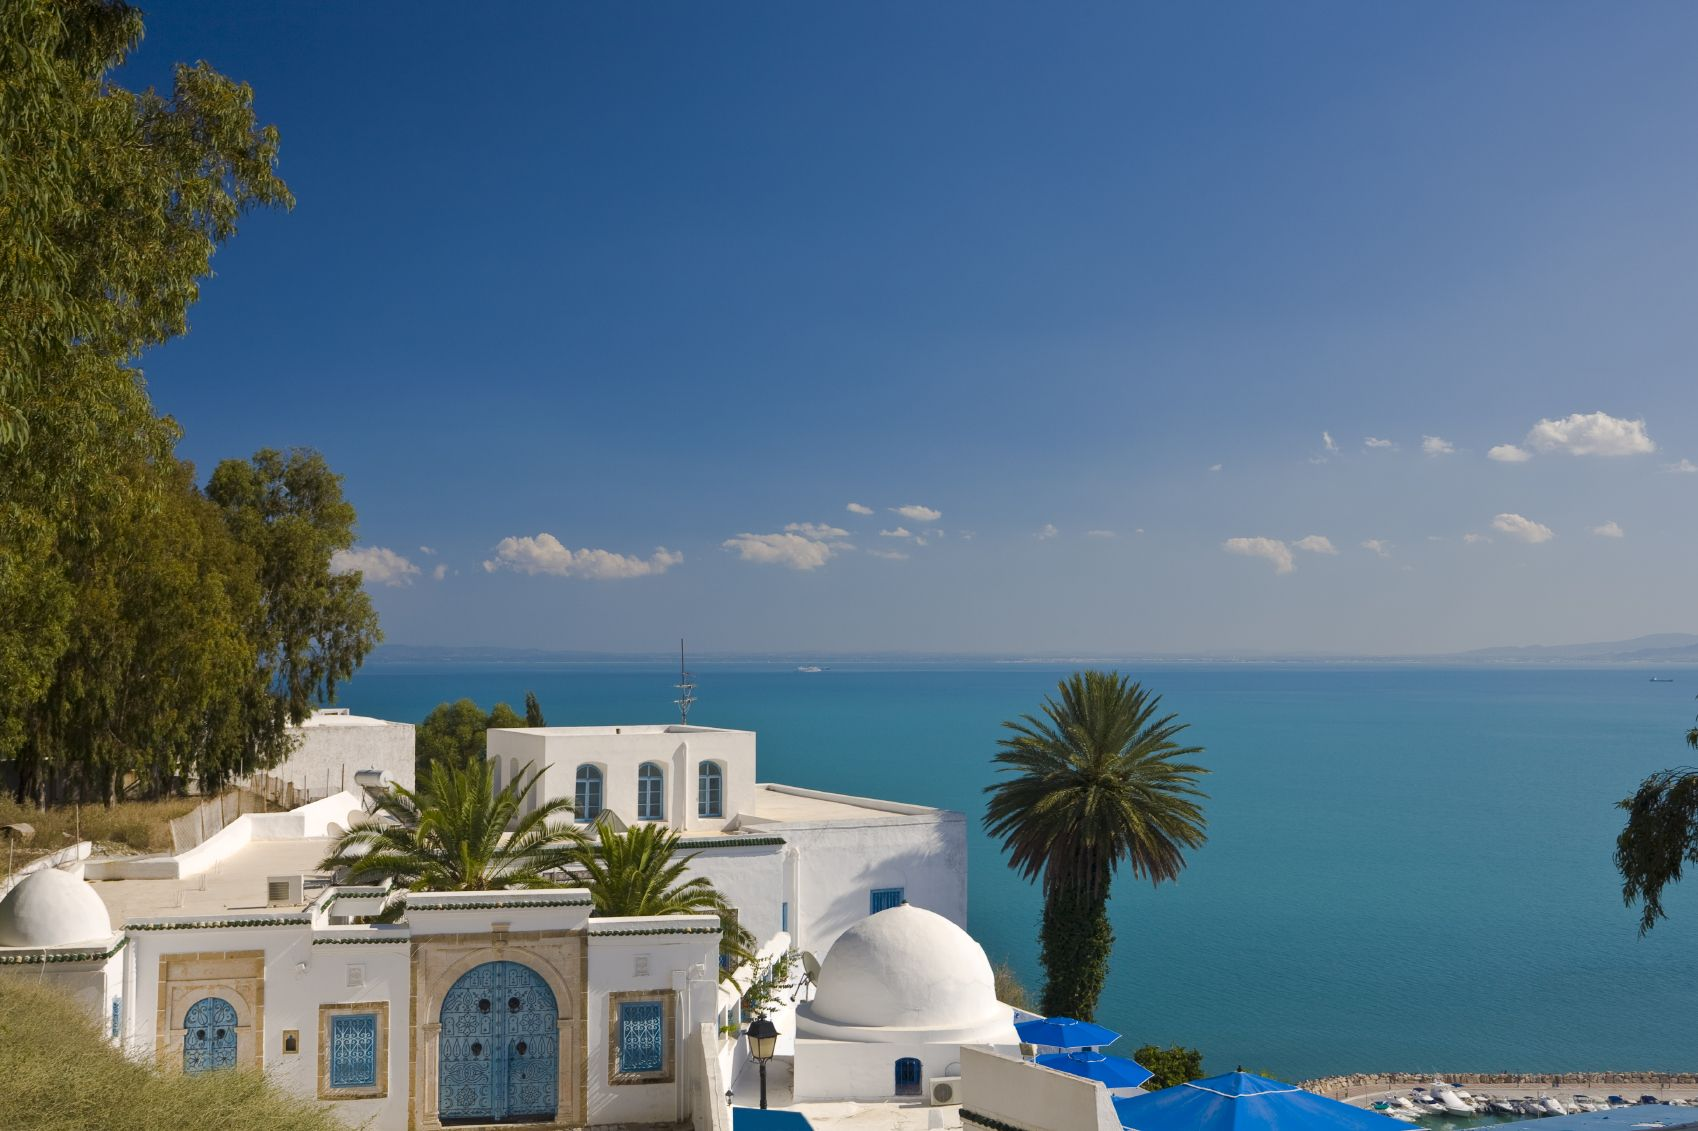 voyage tunisie haut de gamme